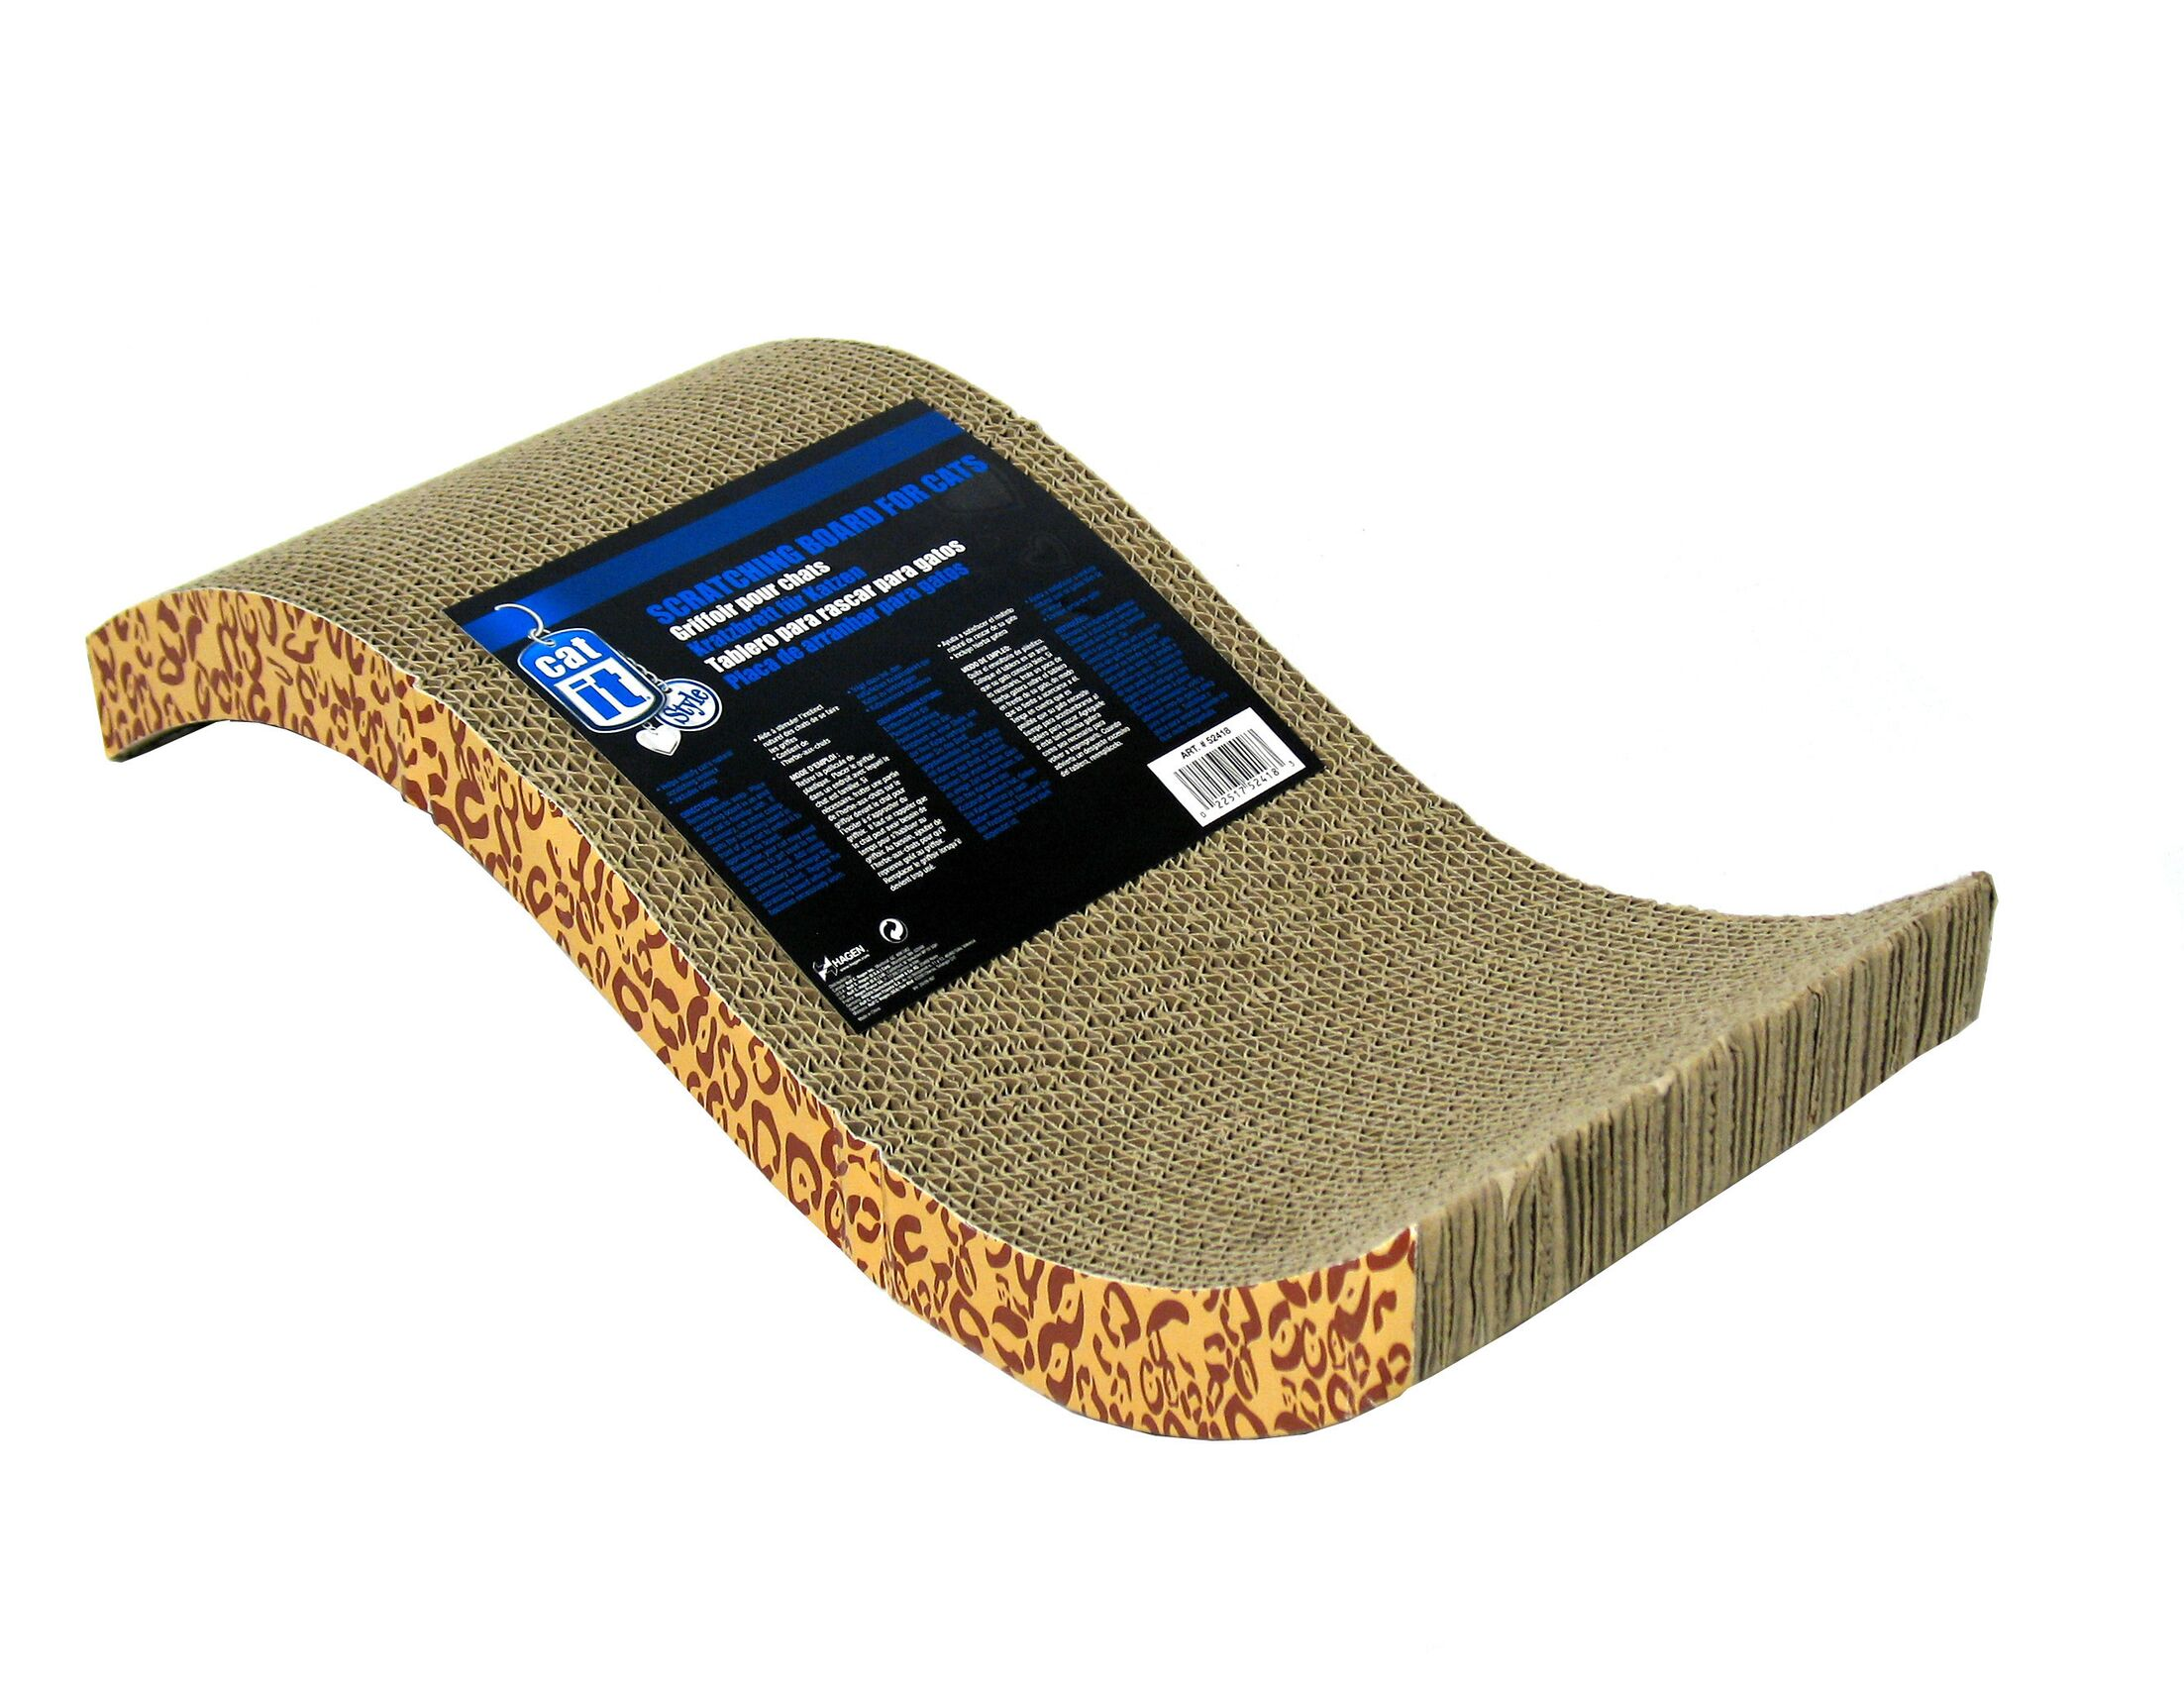 Catit S-Chaise Cardboard Scratching Board